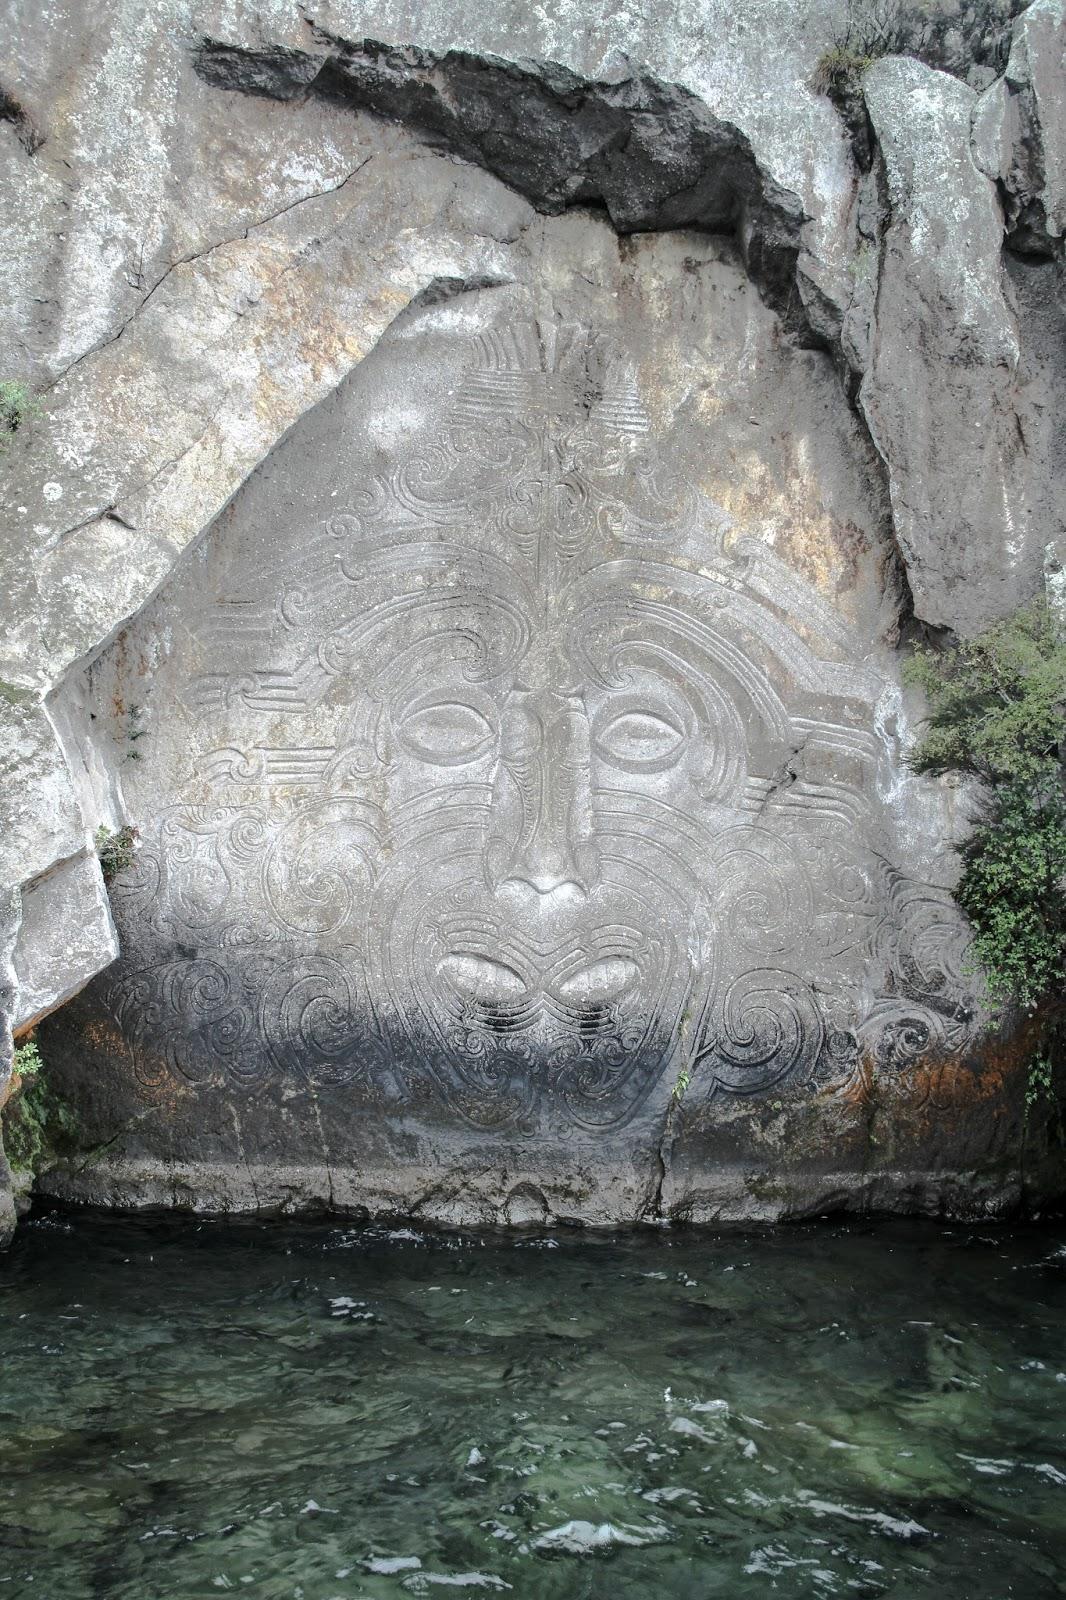 Sir tobi the tall maori stone carvings